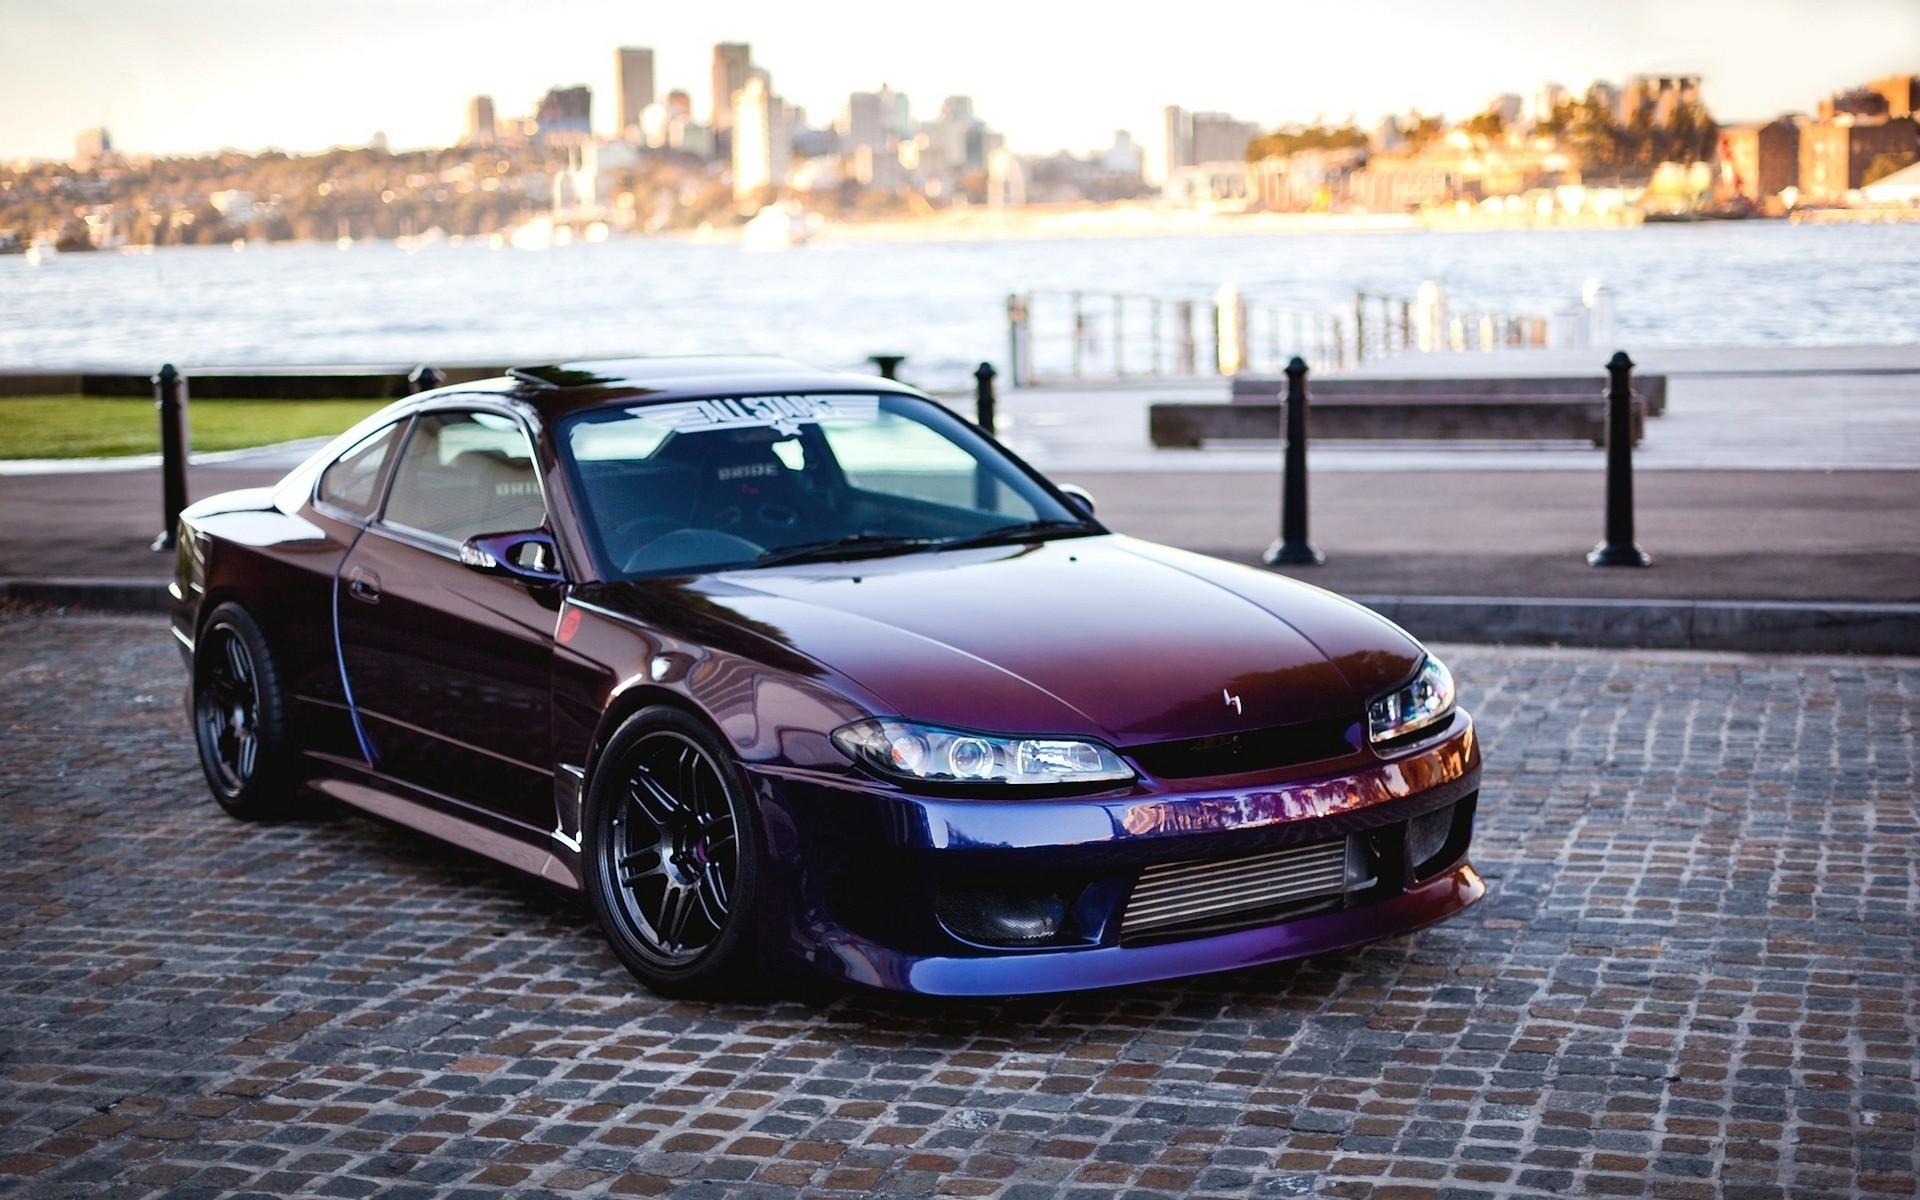 Nissan Silvia Jdm Nissan Silvia S15 Jdm 1920x1200 Wallpaper Teahub Io